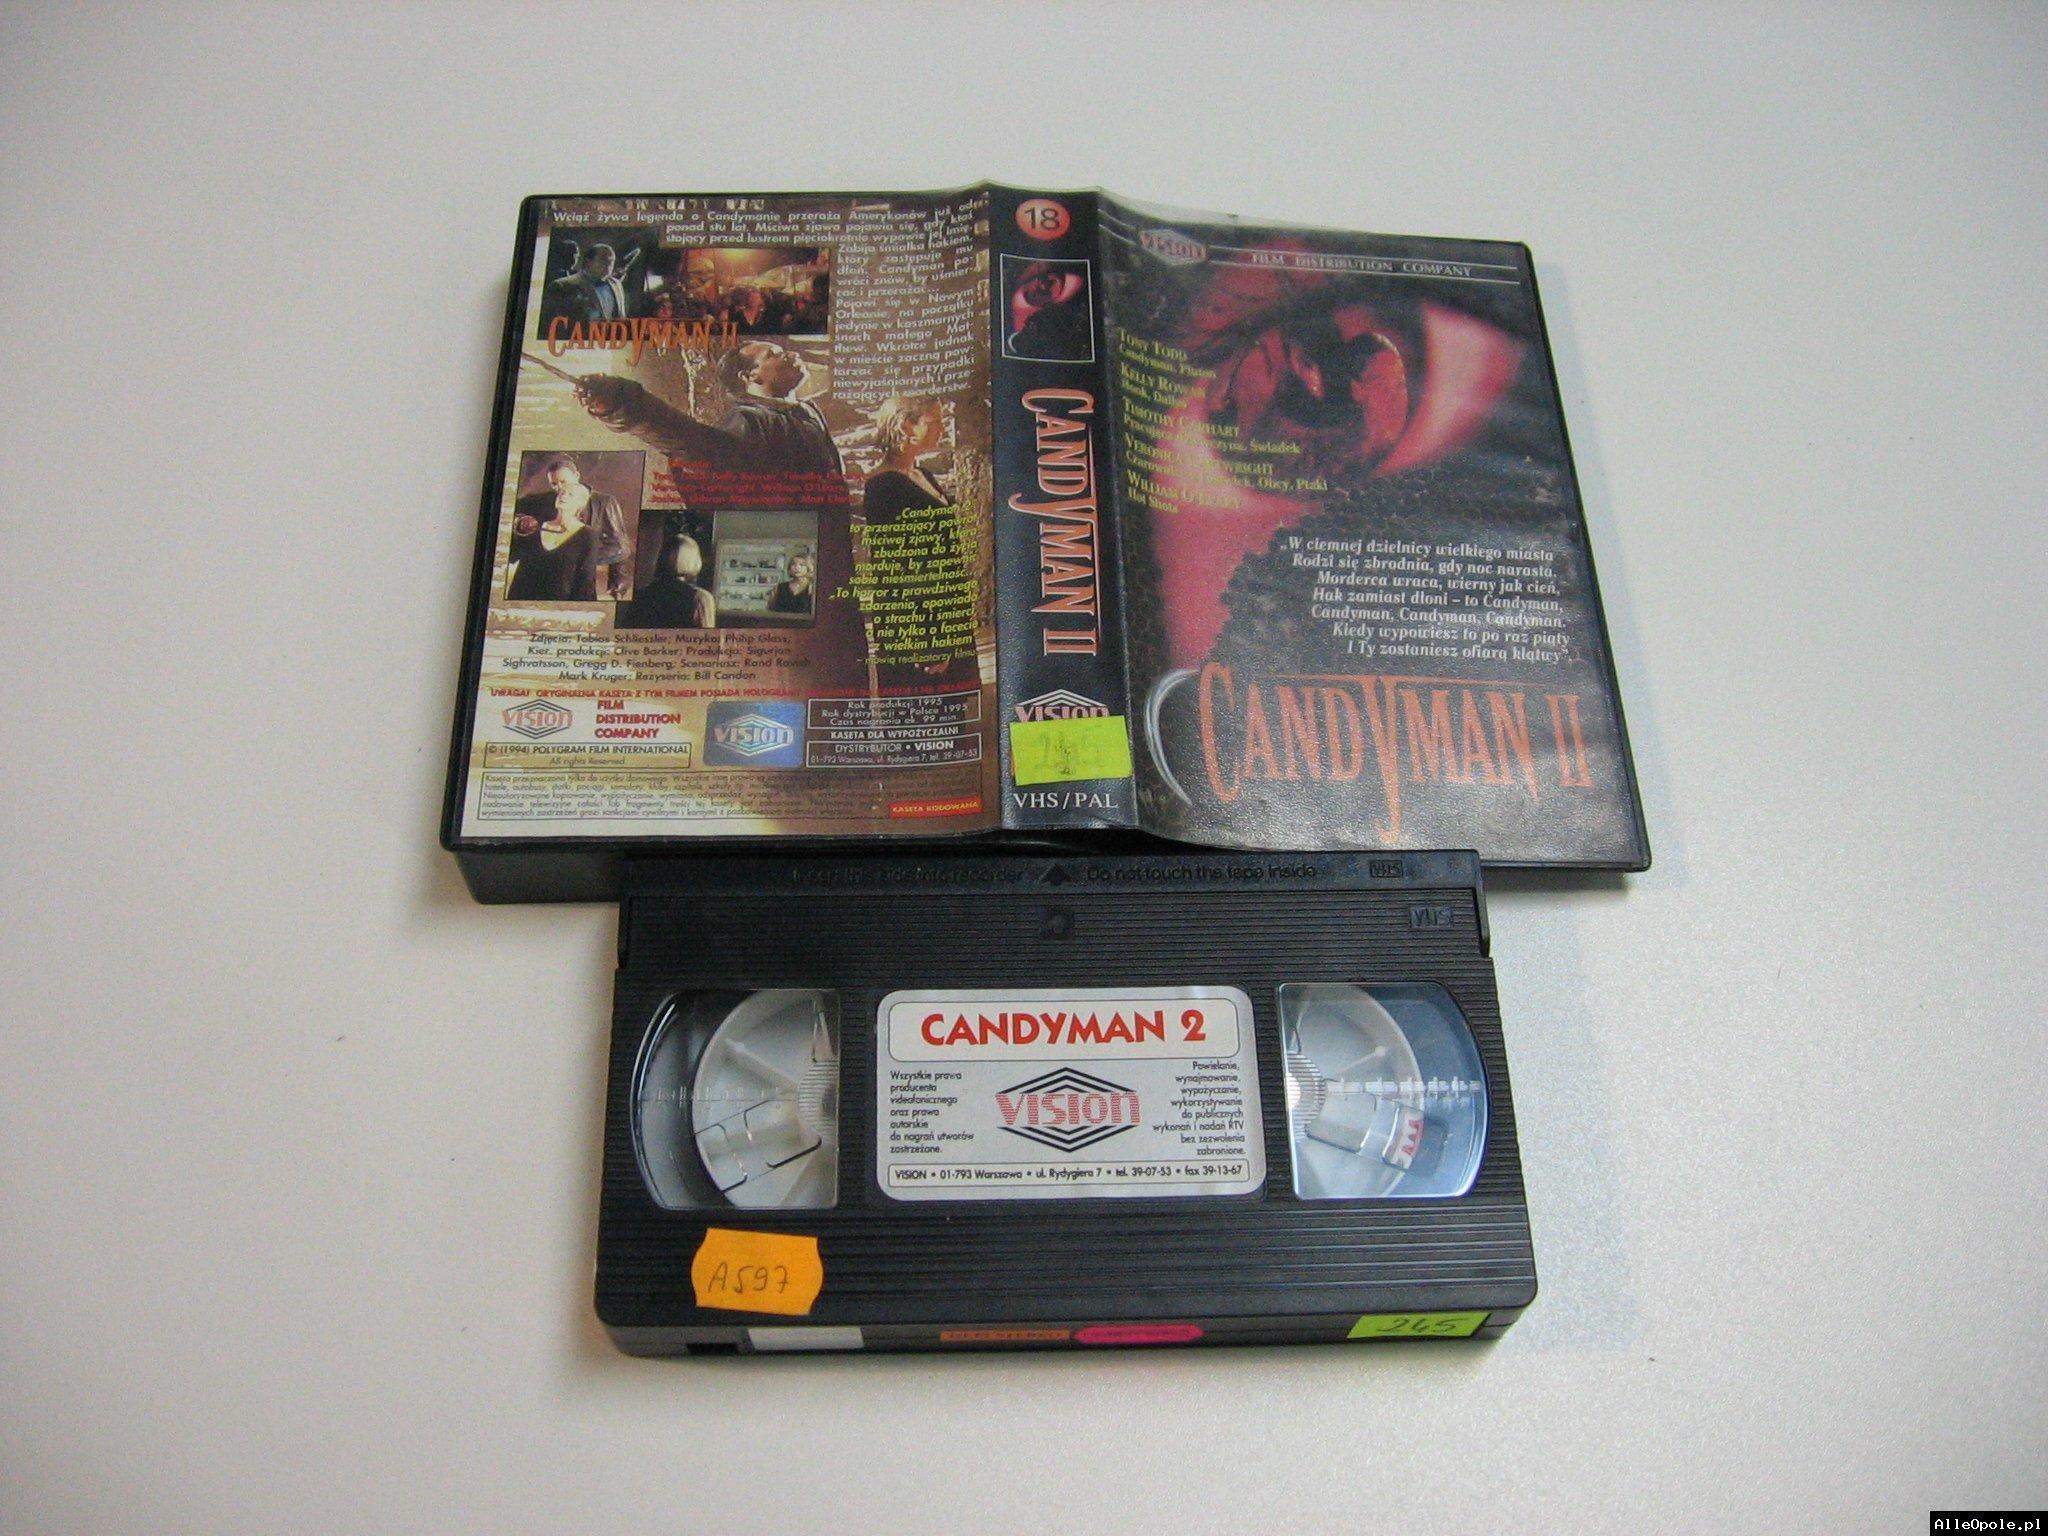 CANDYMAN 2 - VHS Kaseta Video - Opole 1845